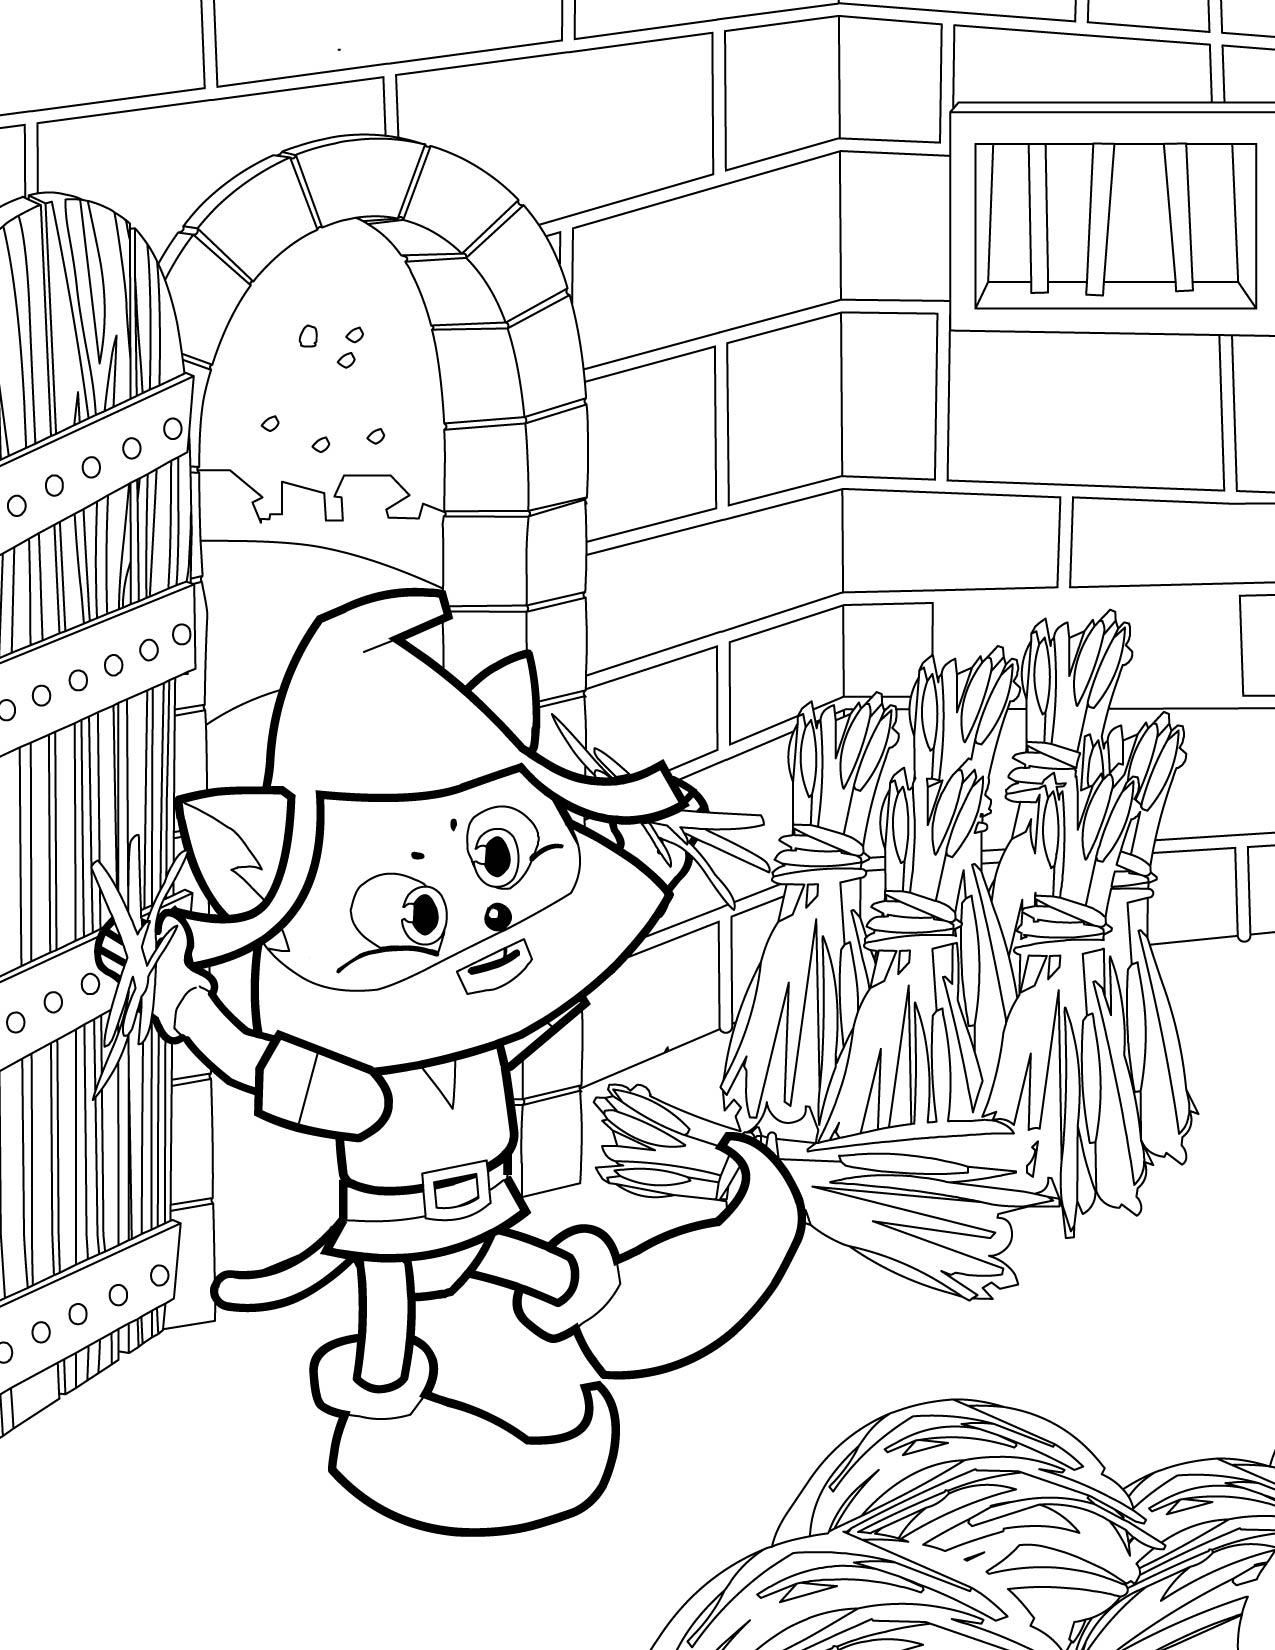 rumpelstiltskin coloring page handipoints